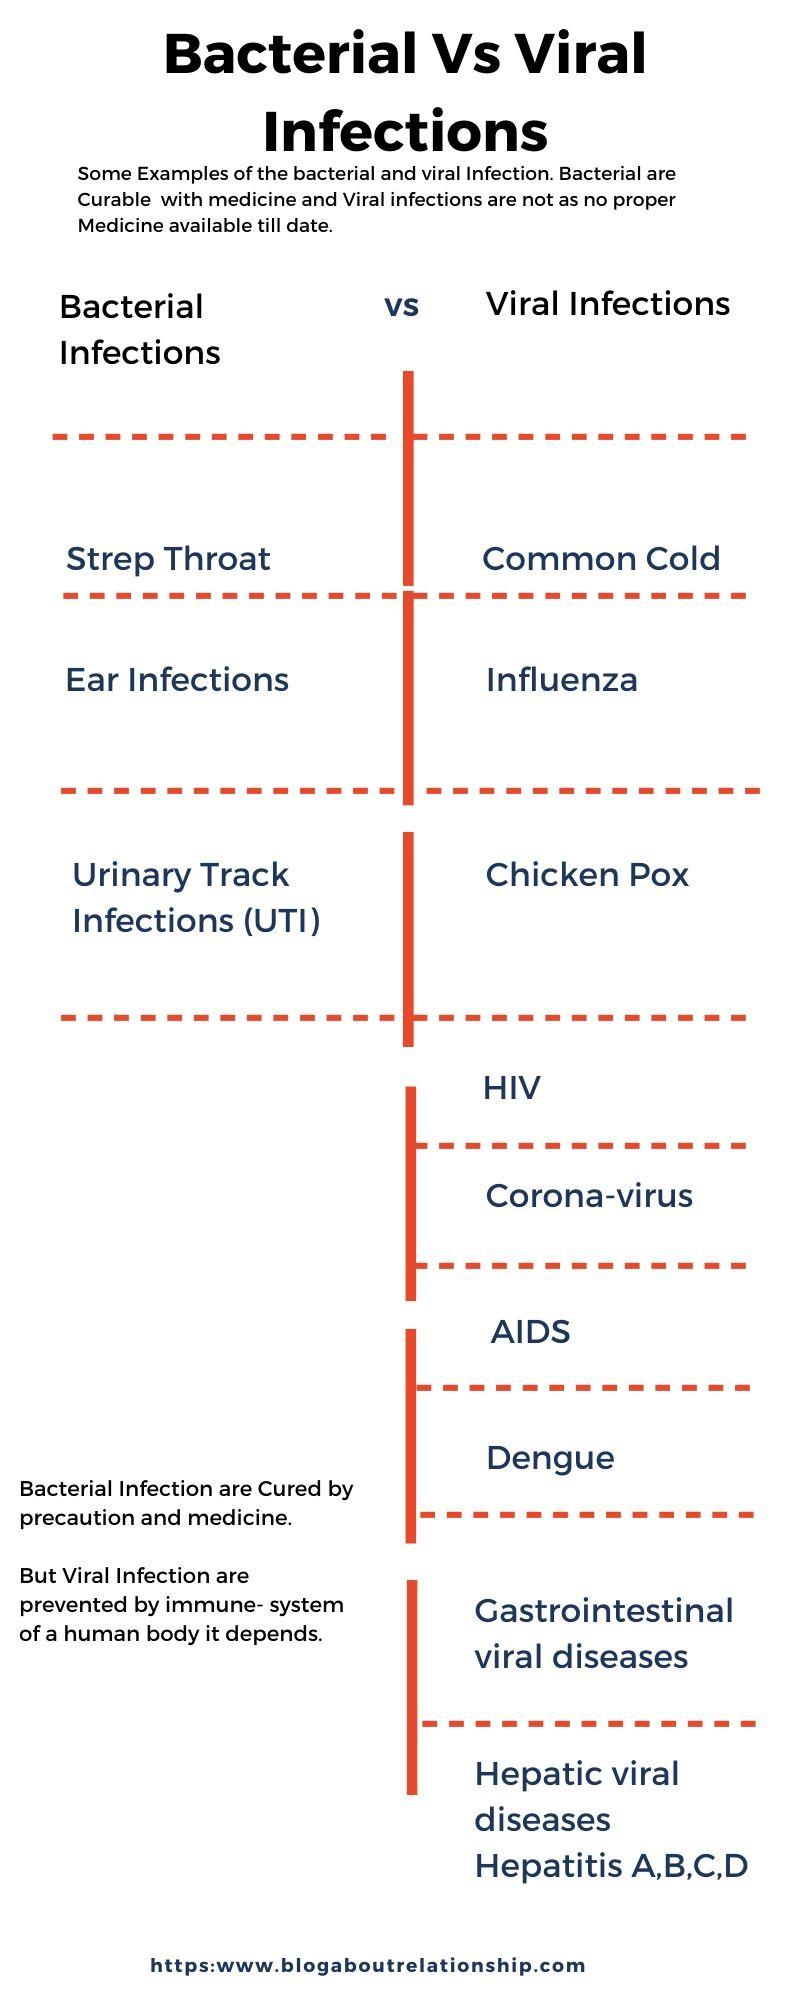 coronavirus-symptoms-protection -bacterial-viral-infections